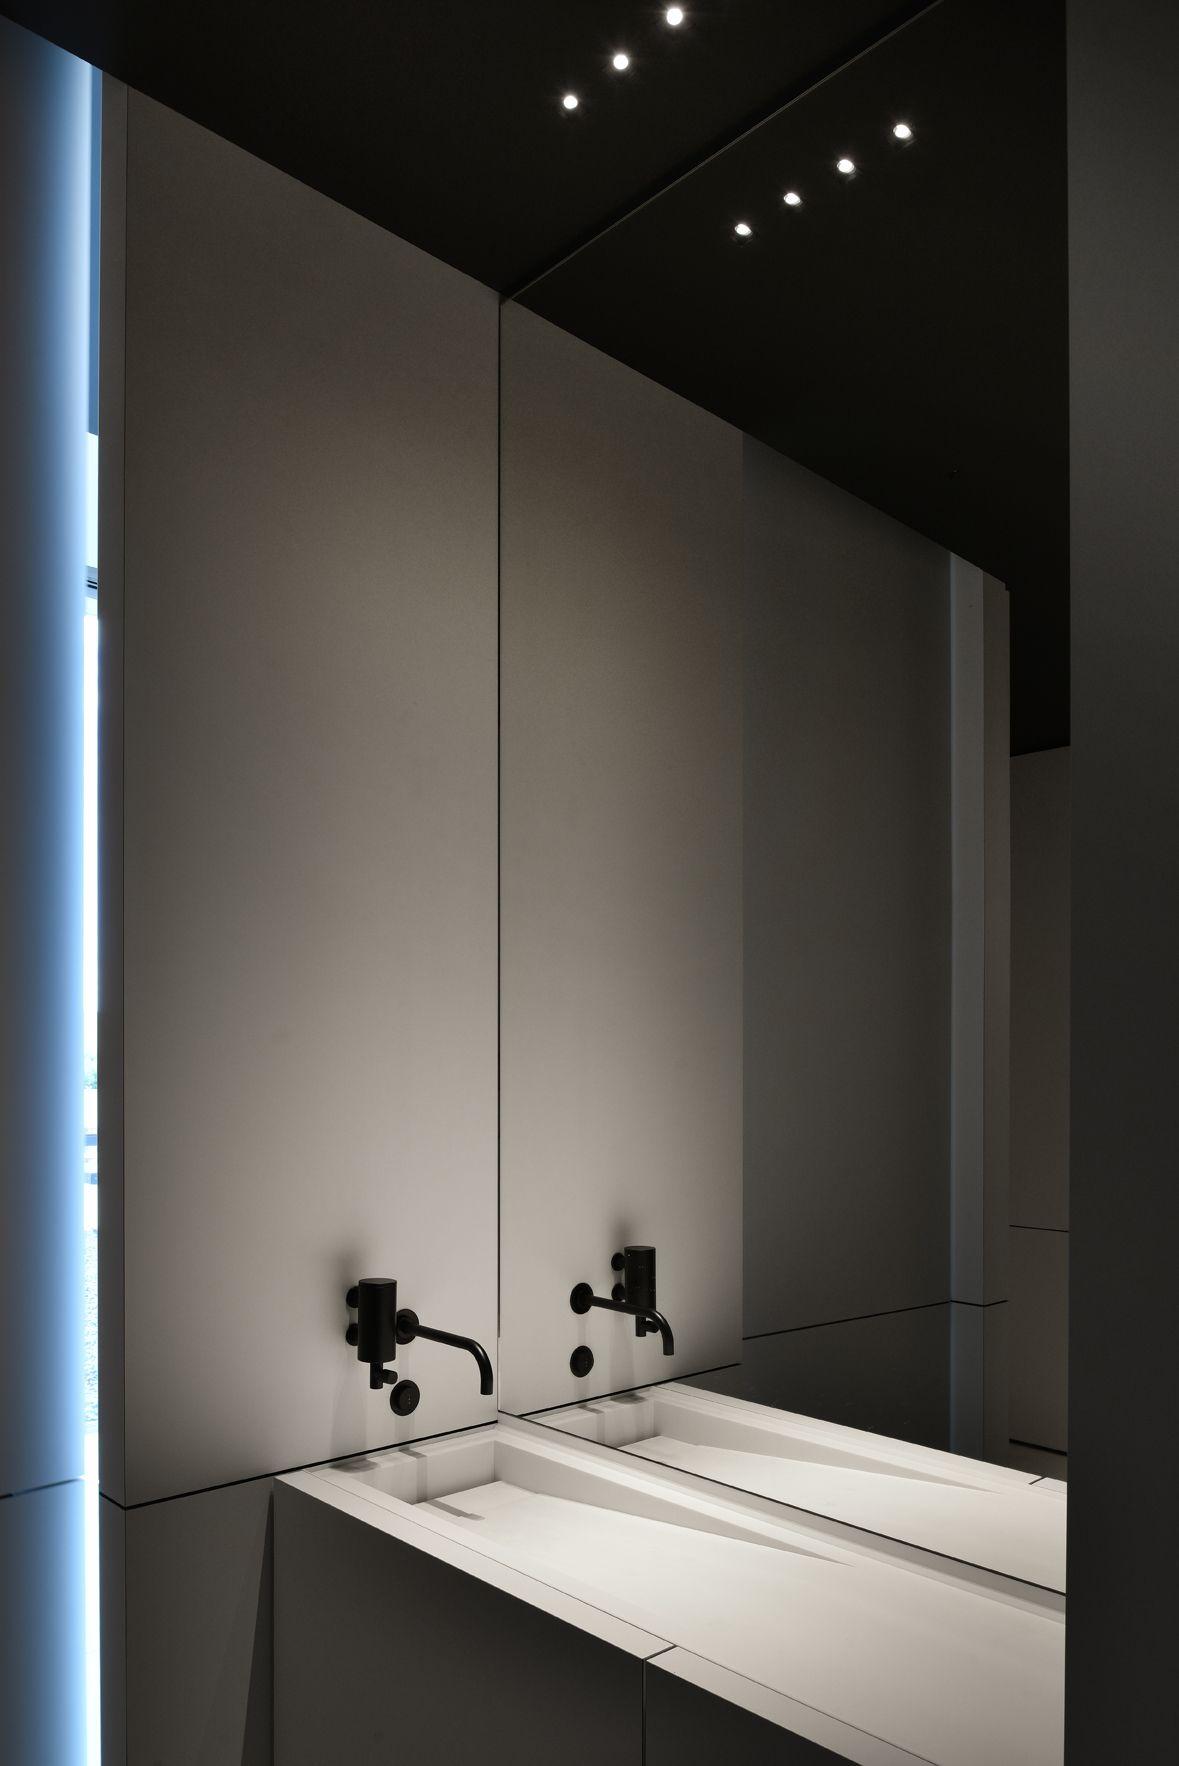 Kreon Lighting Wash Basin In The Kreon Lighting HQ Belgium R Ghane